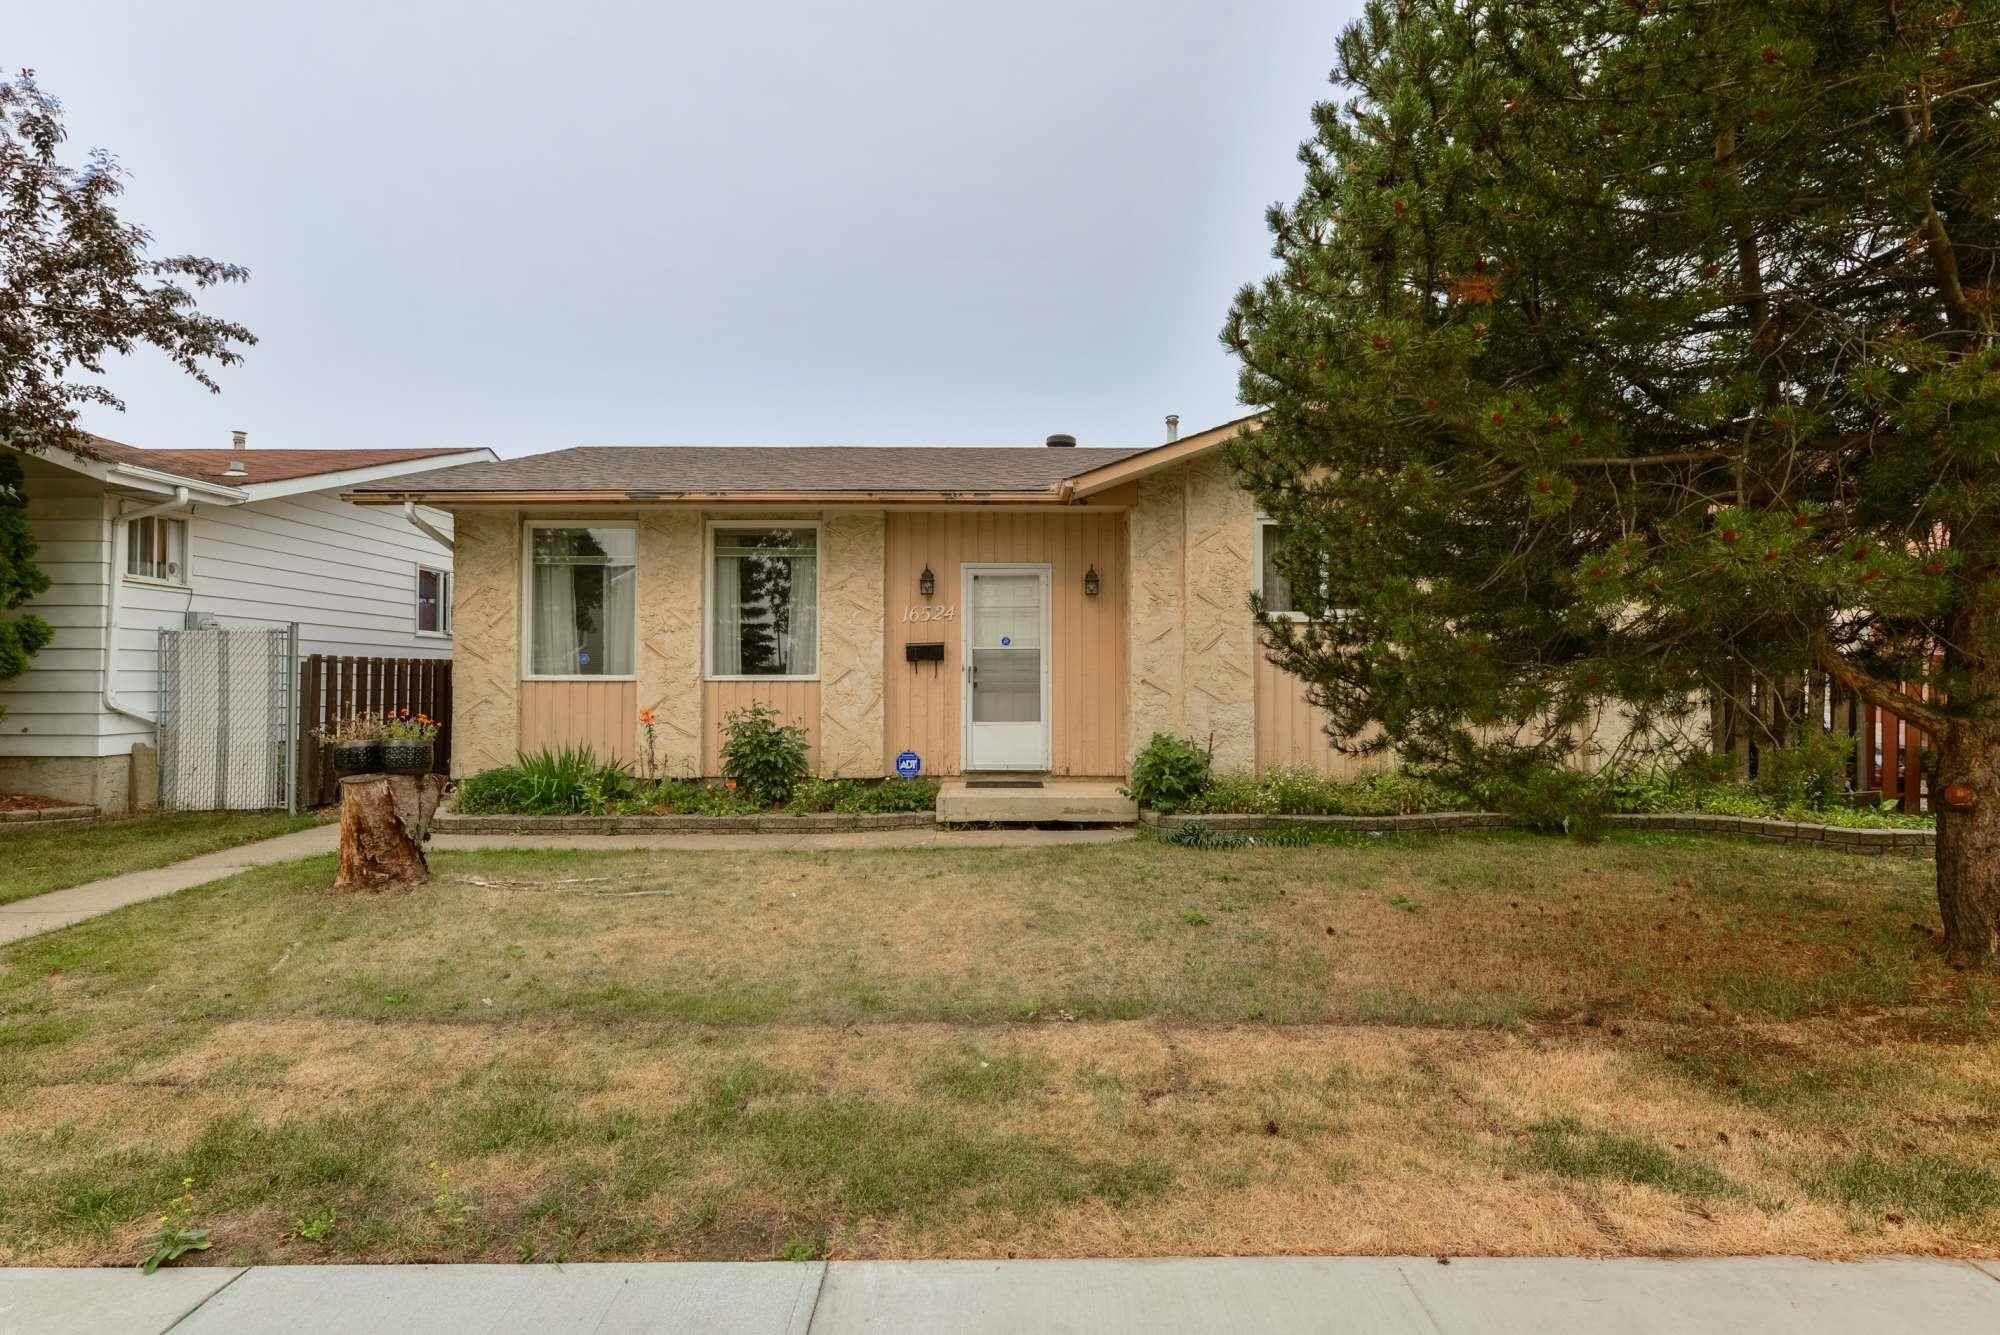 Main Photo: 16524 100 Street in Edmonton: Zone 27 House for sale : MLS®# E4257687